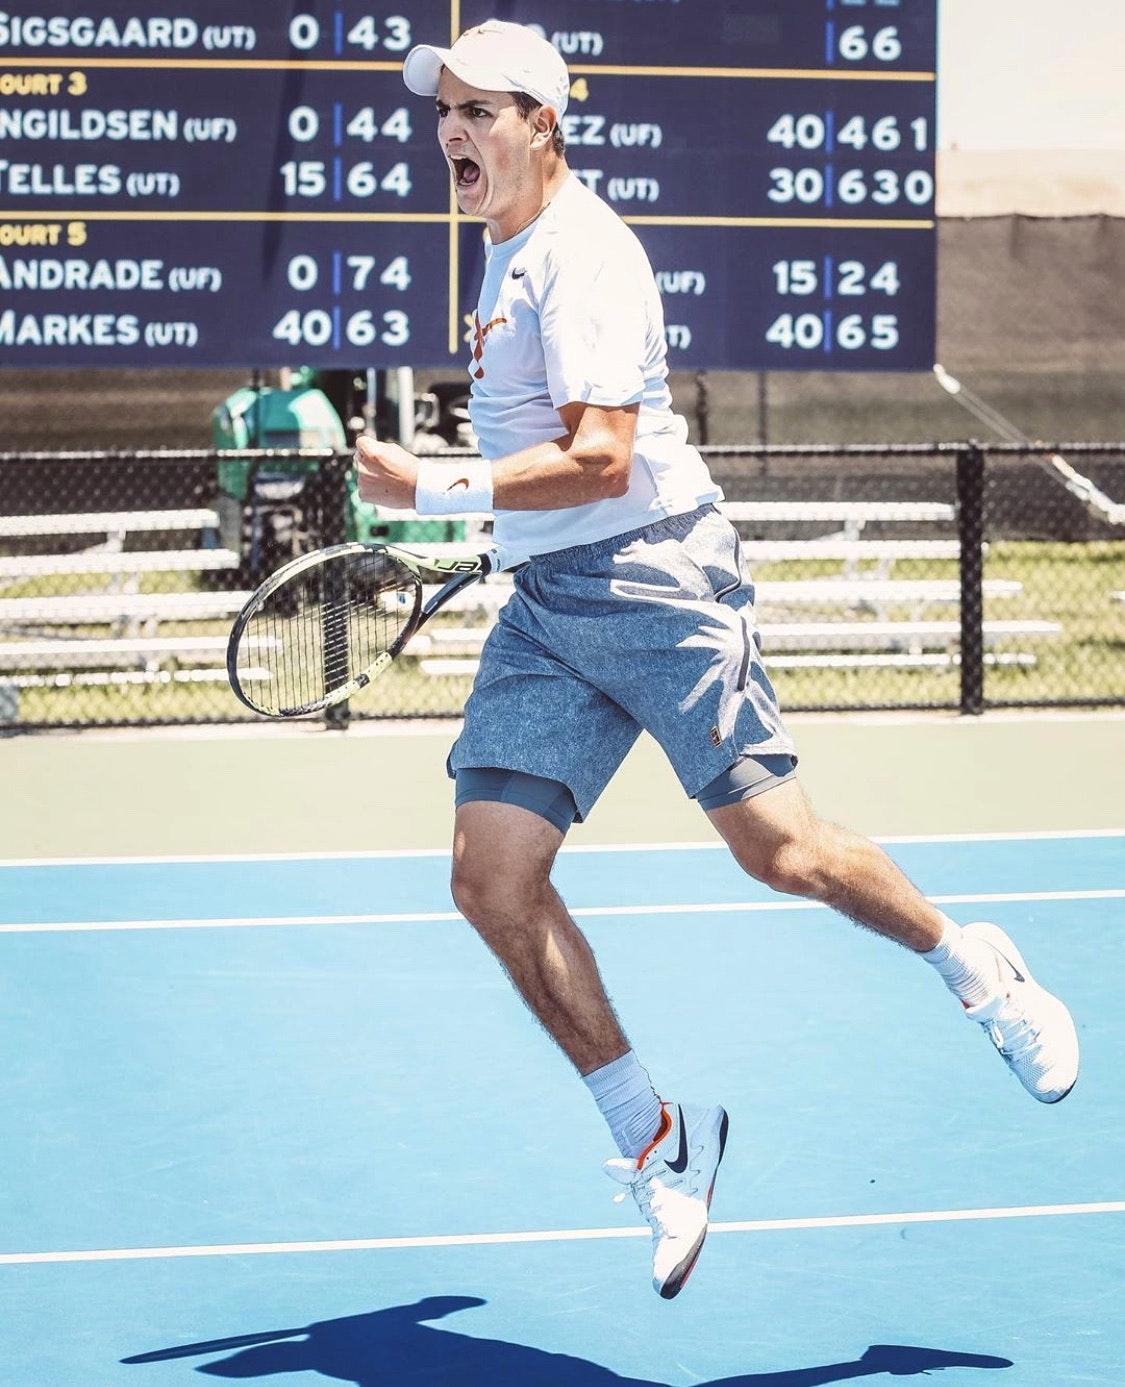 Rodrigo B. teaches tennis lessons in Plantation, FL